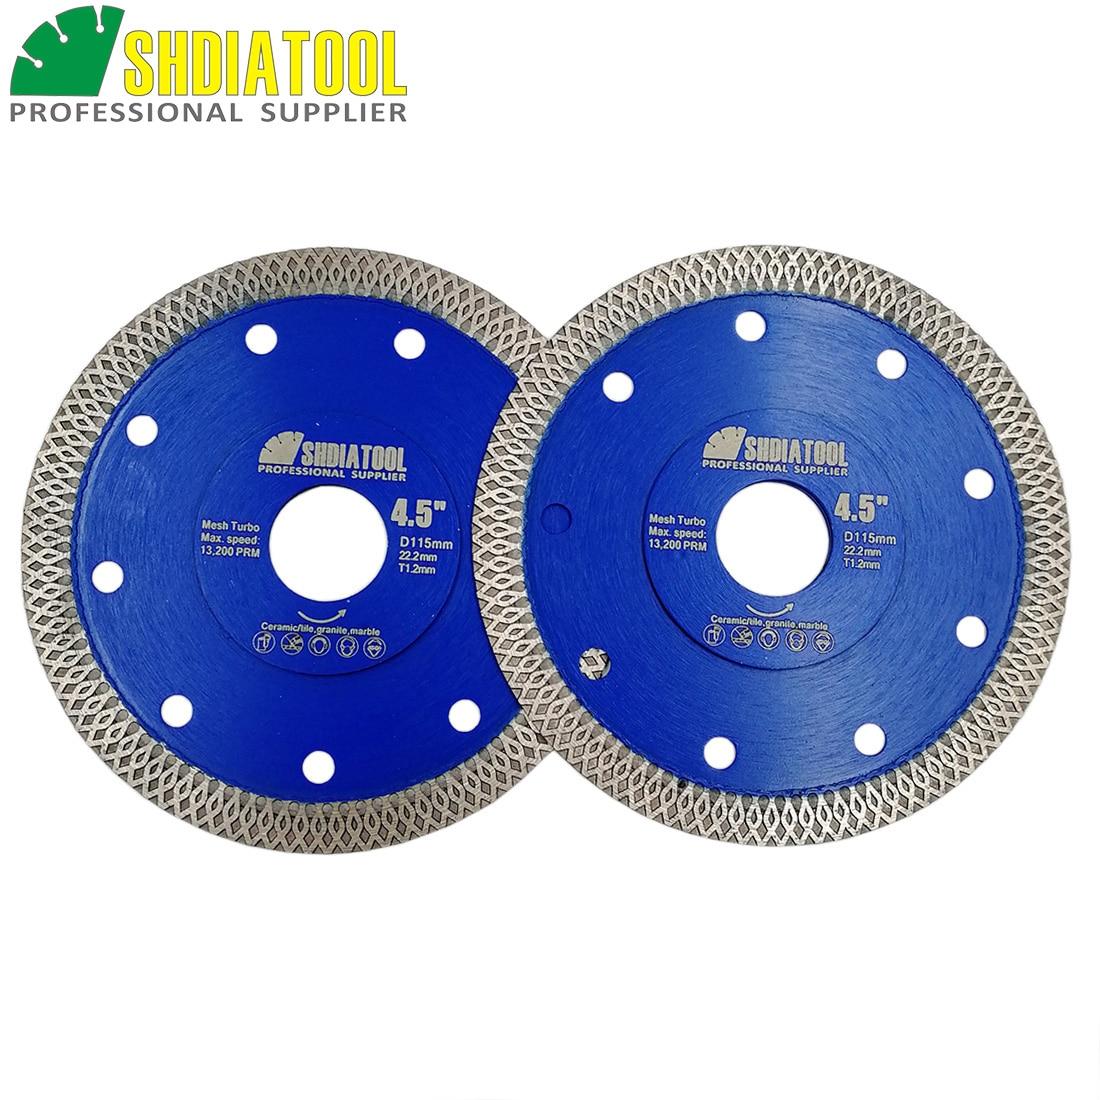 SHDIATOOL 2pcs 115mm Hot pressed X Mesh Turbo Diamond Saw blades Ceramic Tile Cutting Disc Marble granite circular saw blade